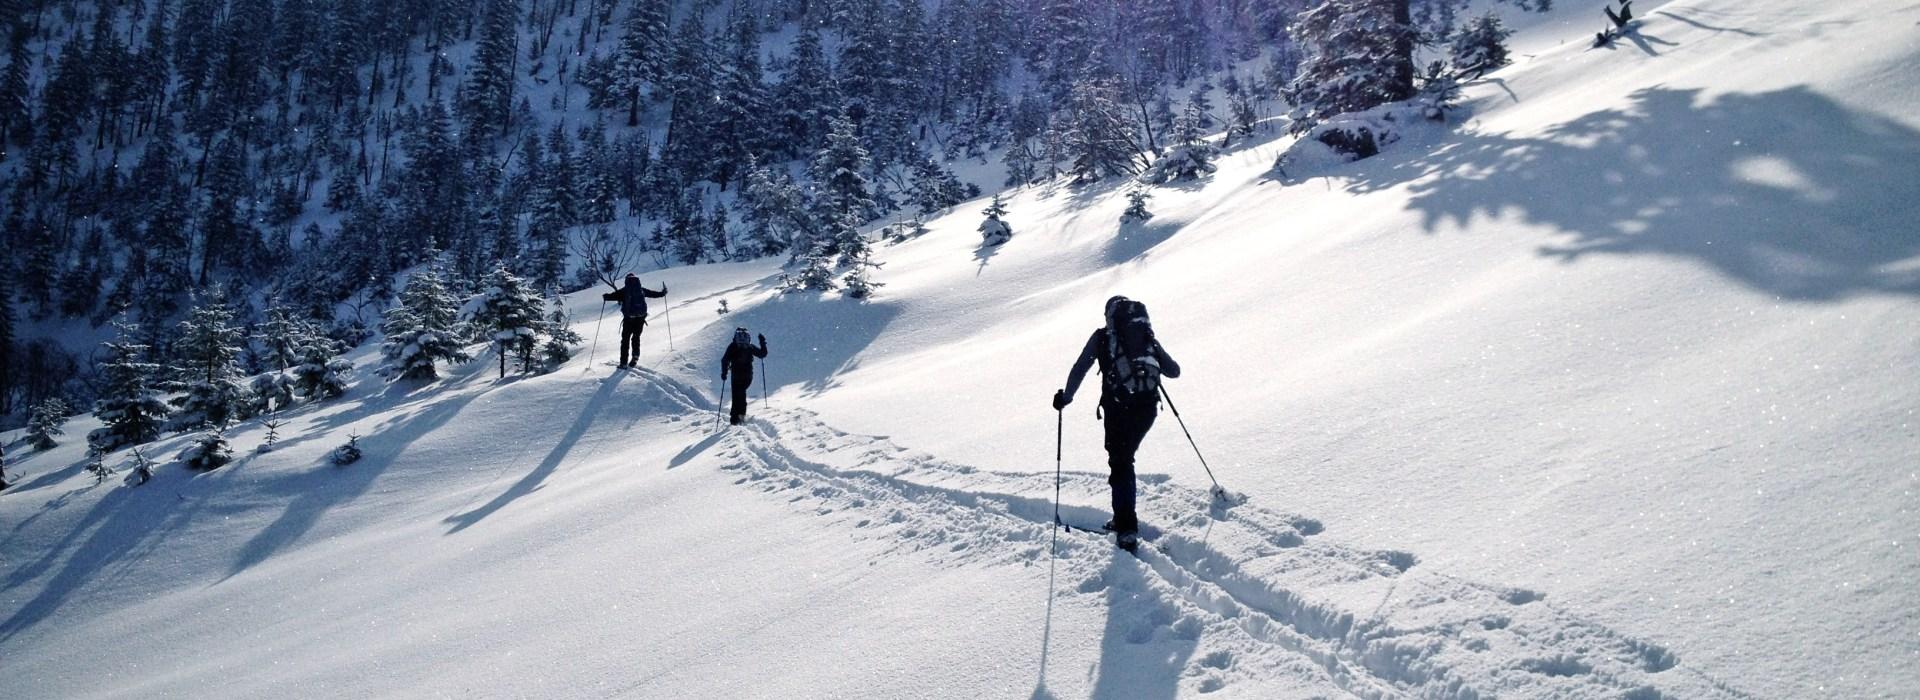 Skitouren in den Alpen